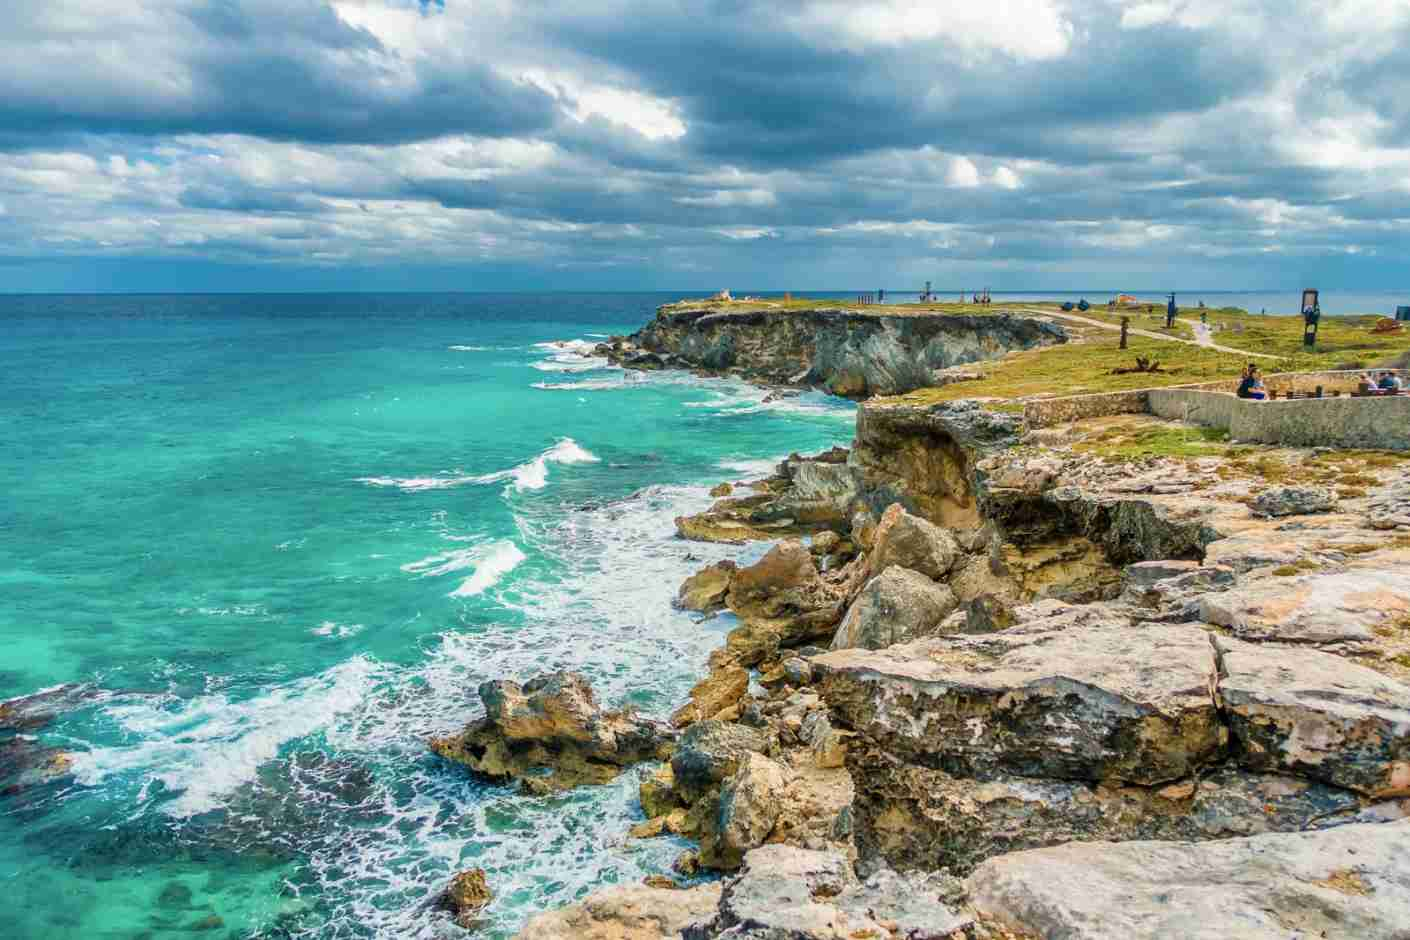 Isla Mujeres. (Photo via Shutterstock)